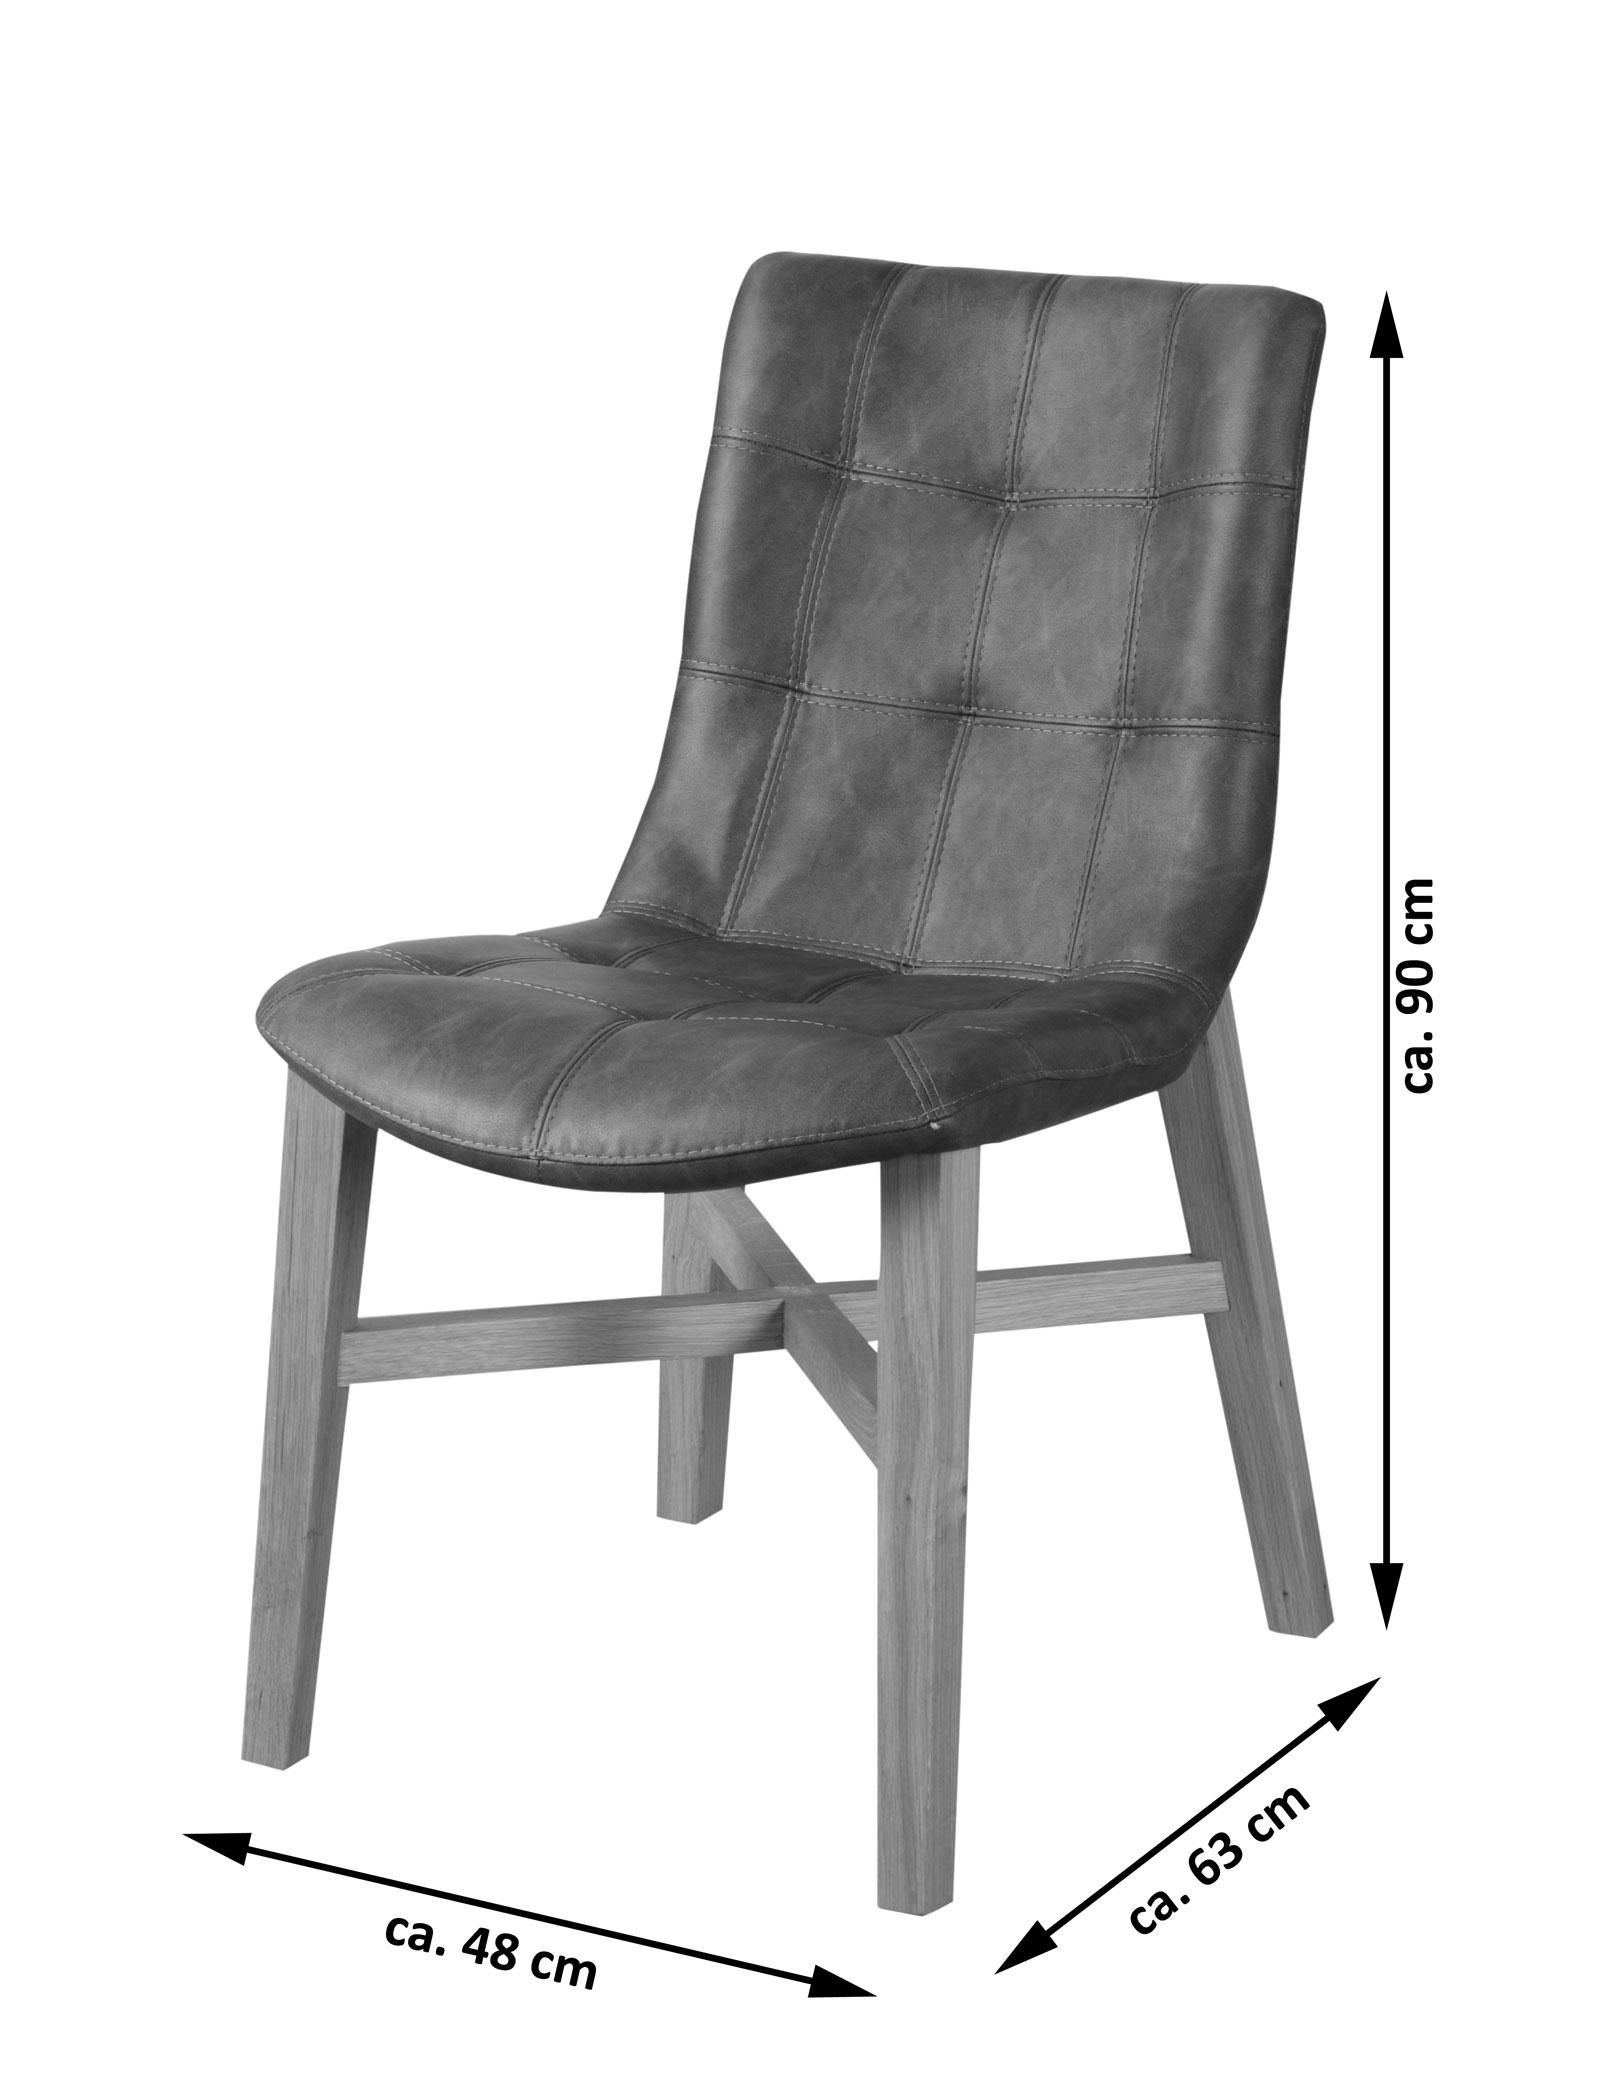 sam esszimmer design stuhl anthrazit eiche bernd. Black Bedroom Furniture Sets. Home Design Ideas